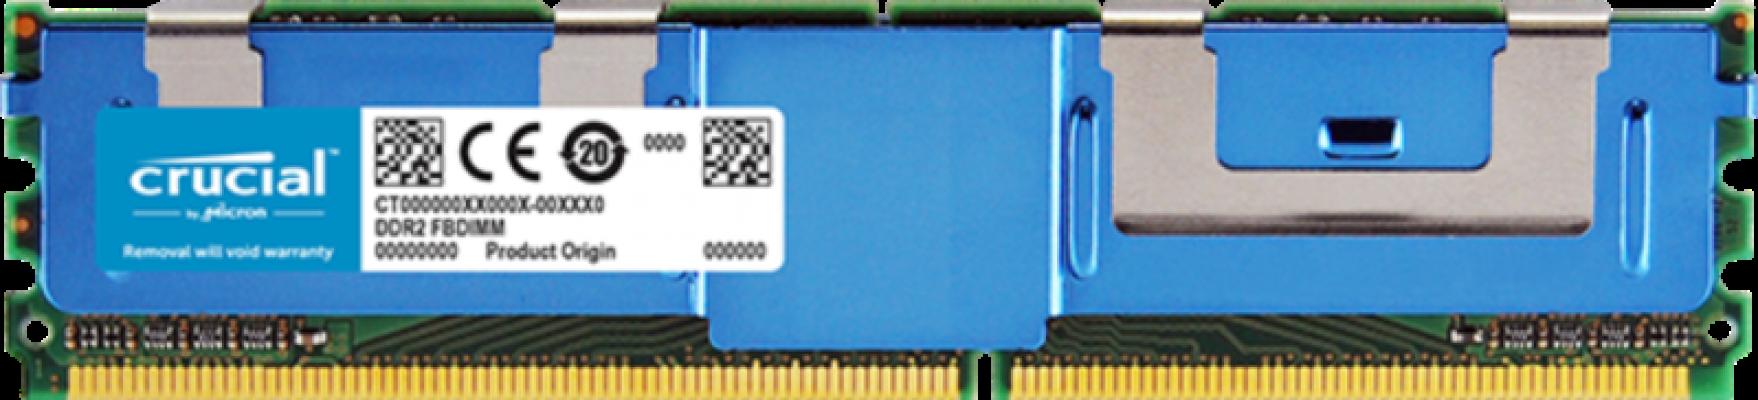 Crucial CT51272AF667 4GB DDR2 667MHz (PC2-5300) CL5 Fully Buffered ECC FBDIMM 240pin